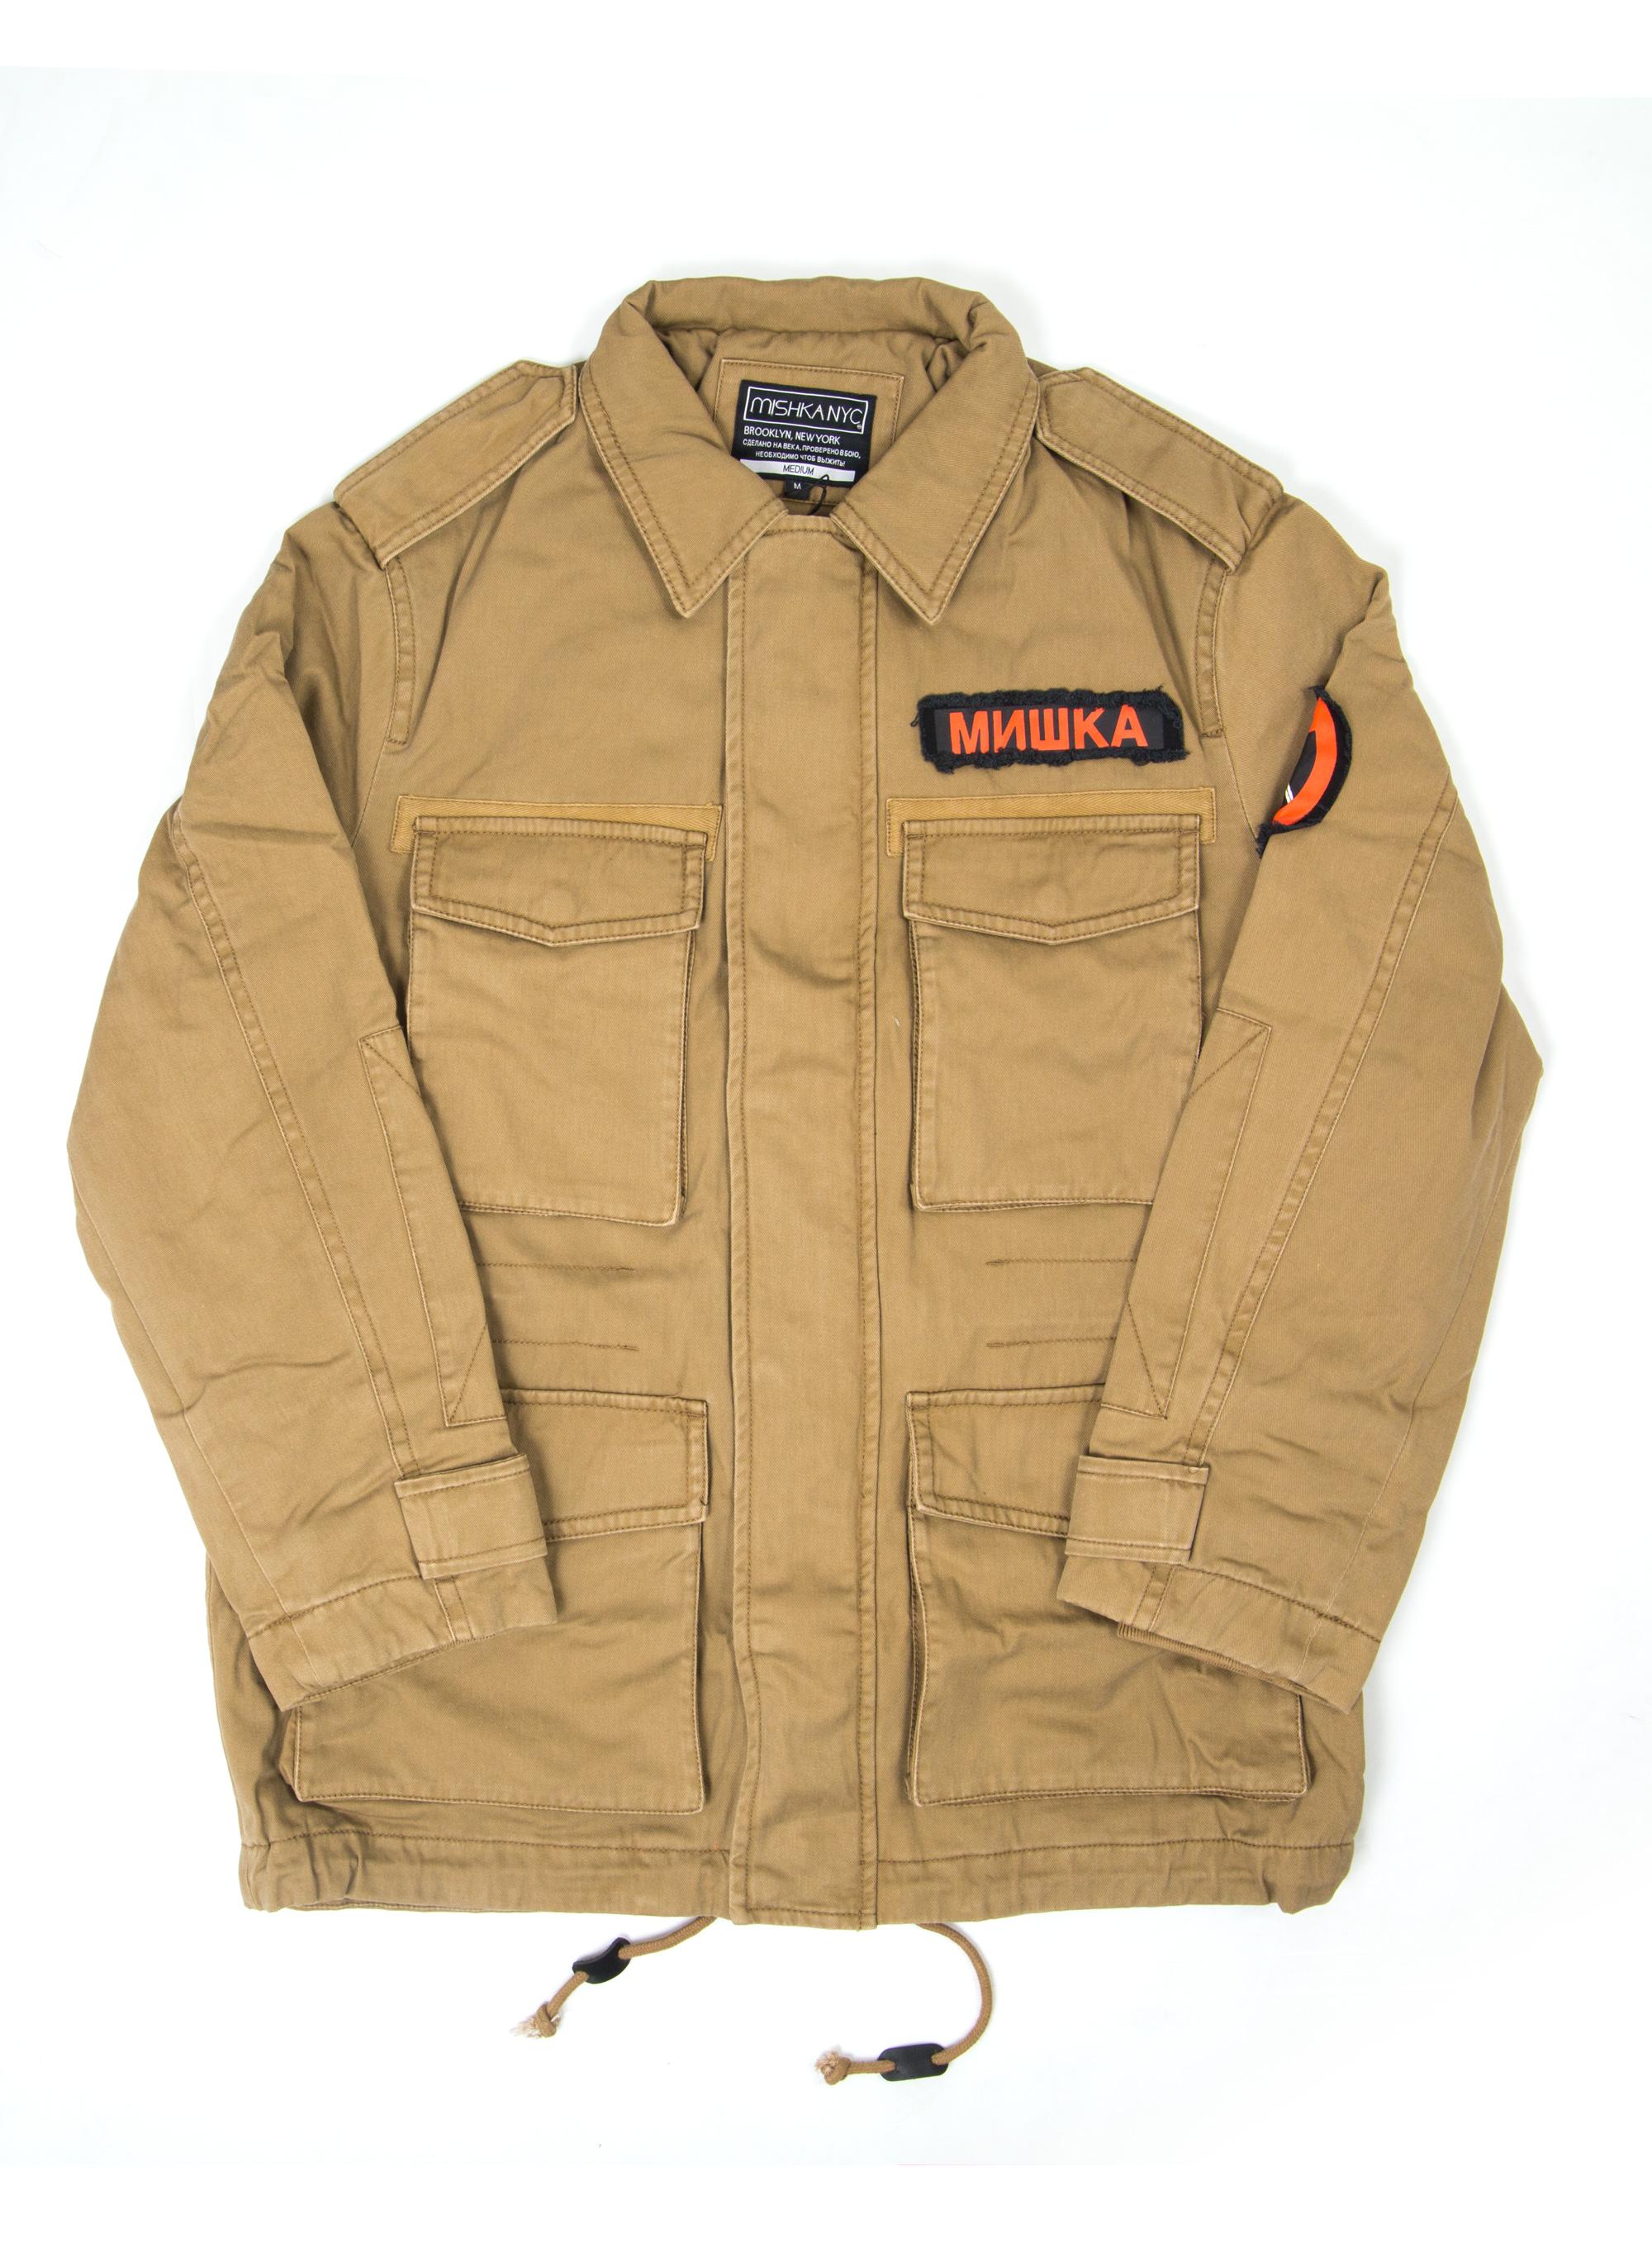 Mishka TV Jacket